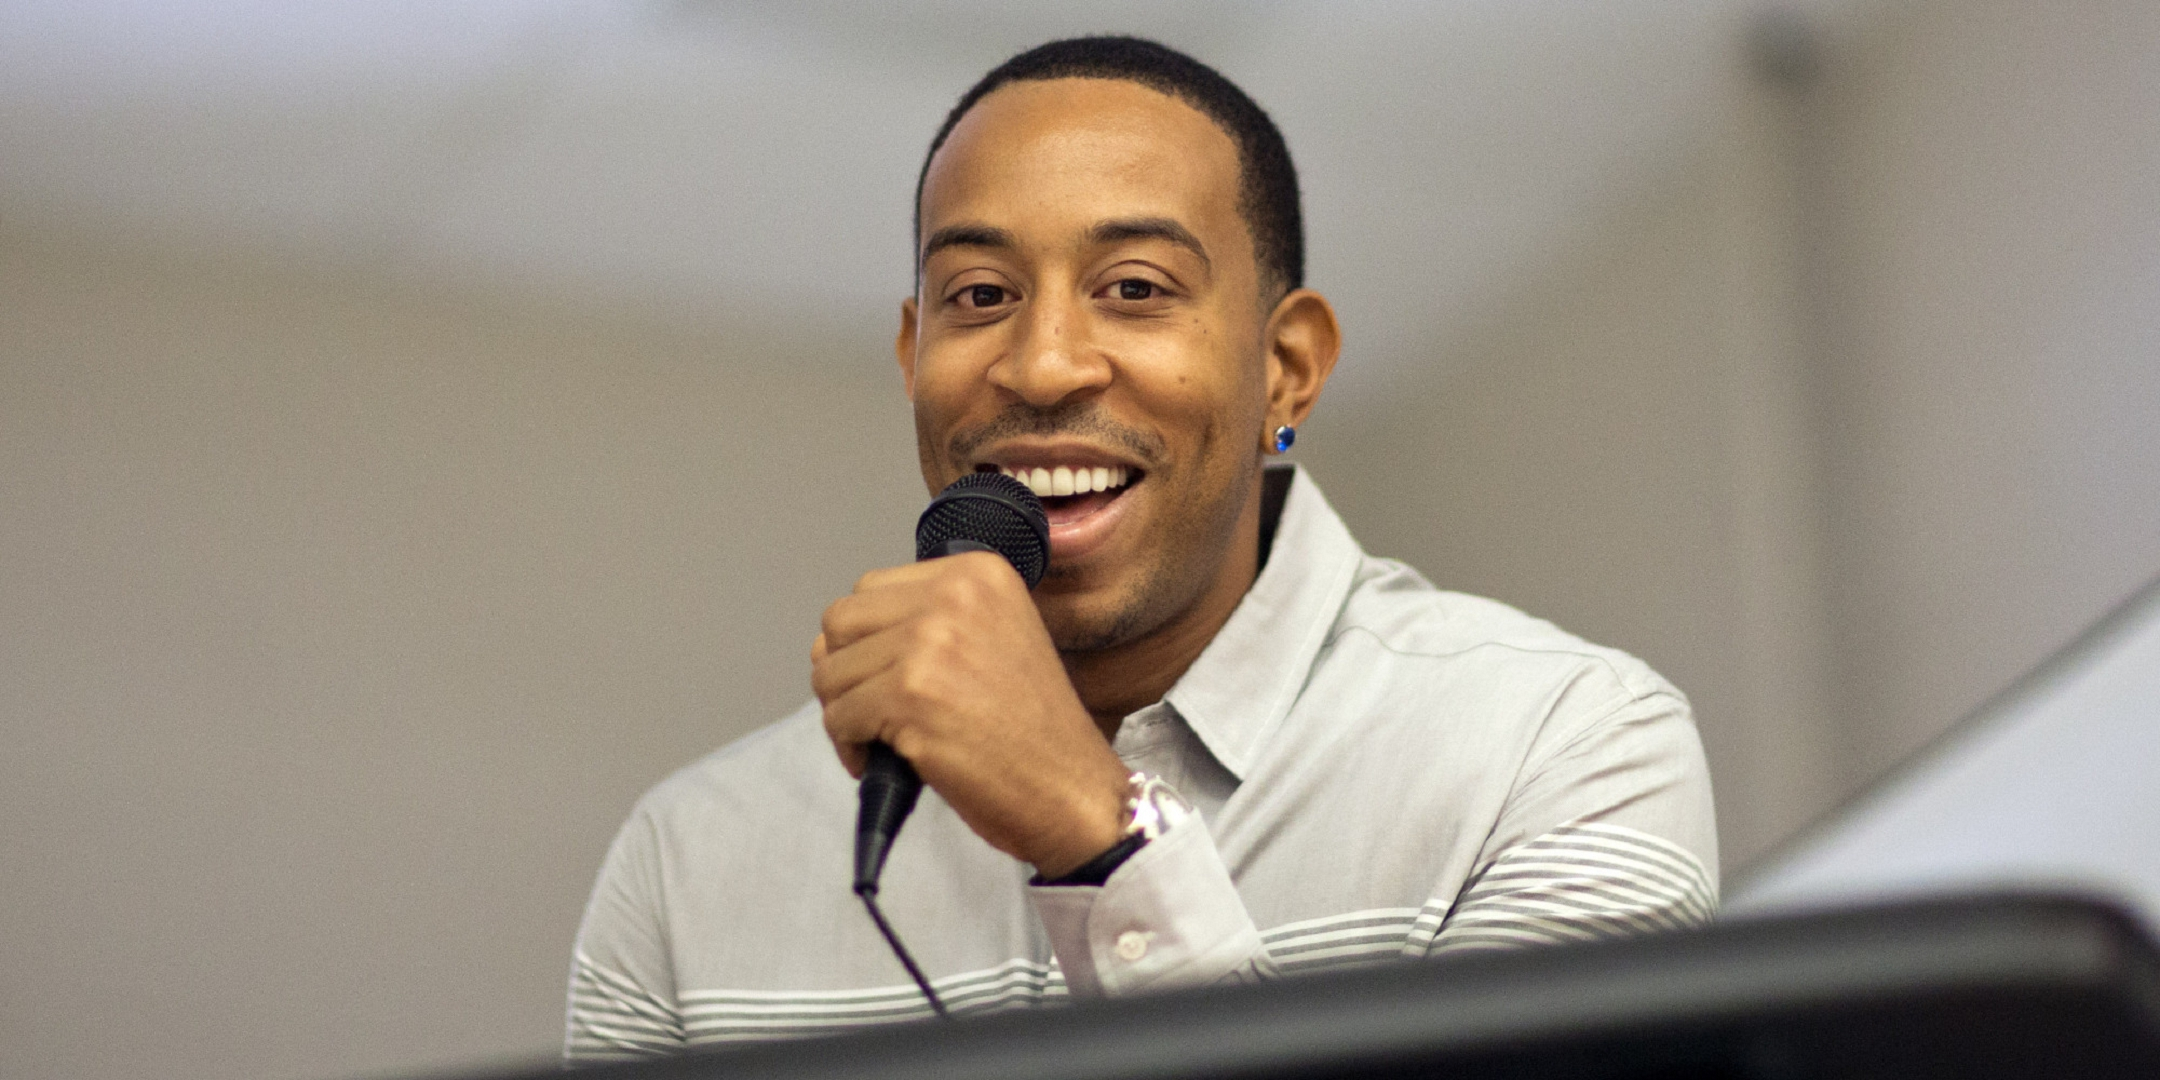 Ludacris Wallpaper For Computer